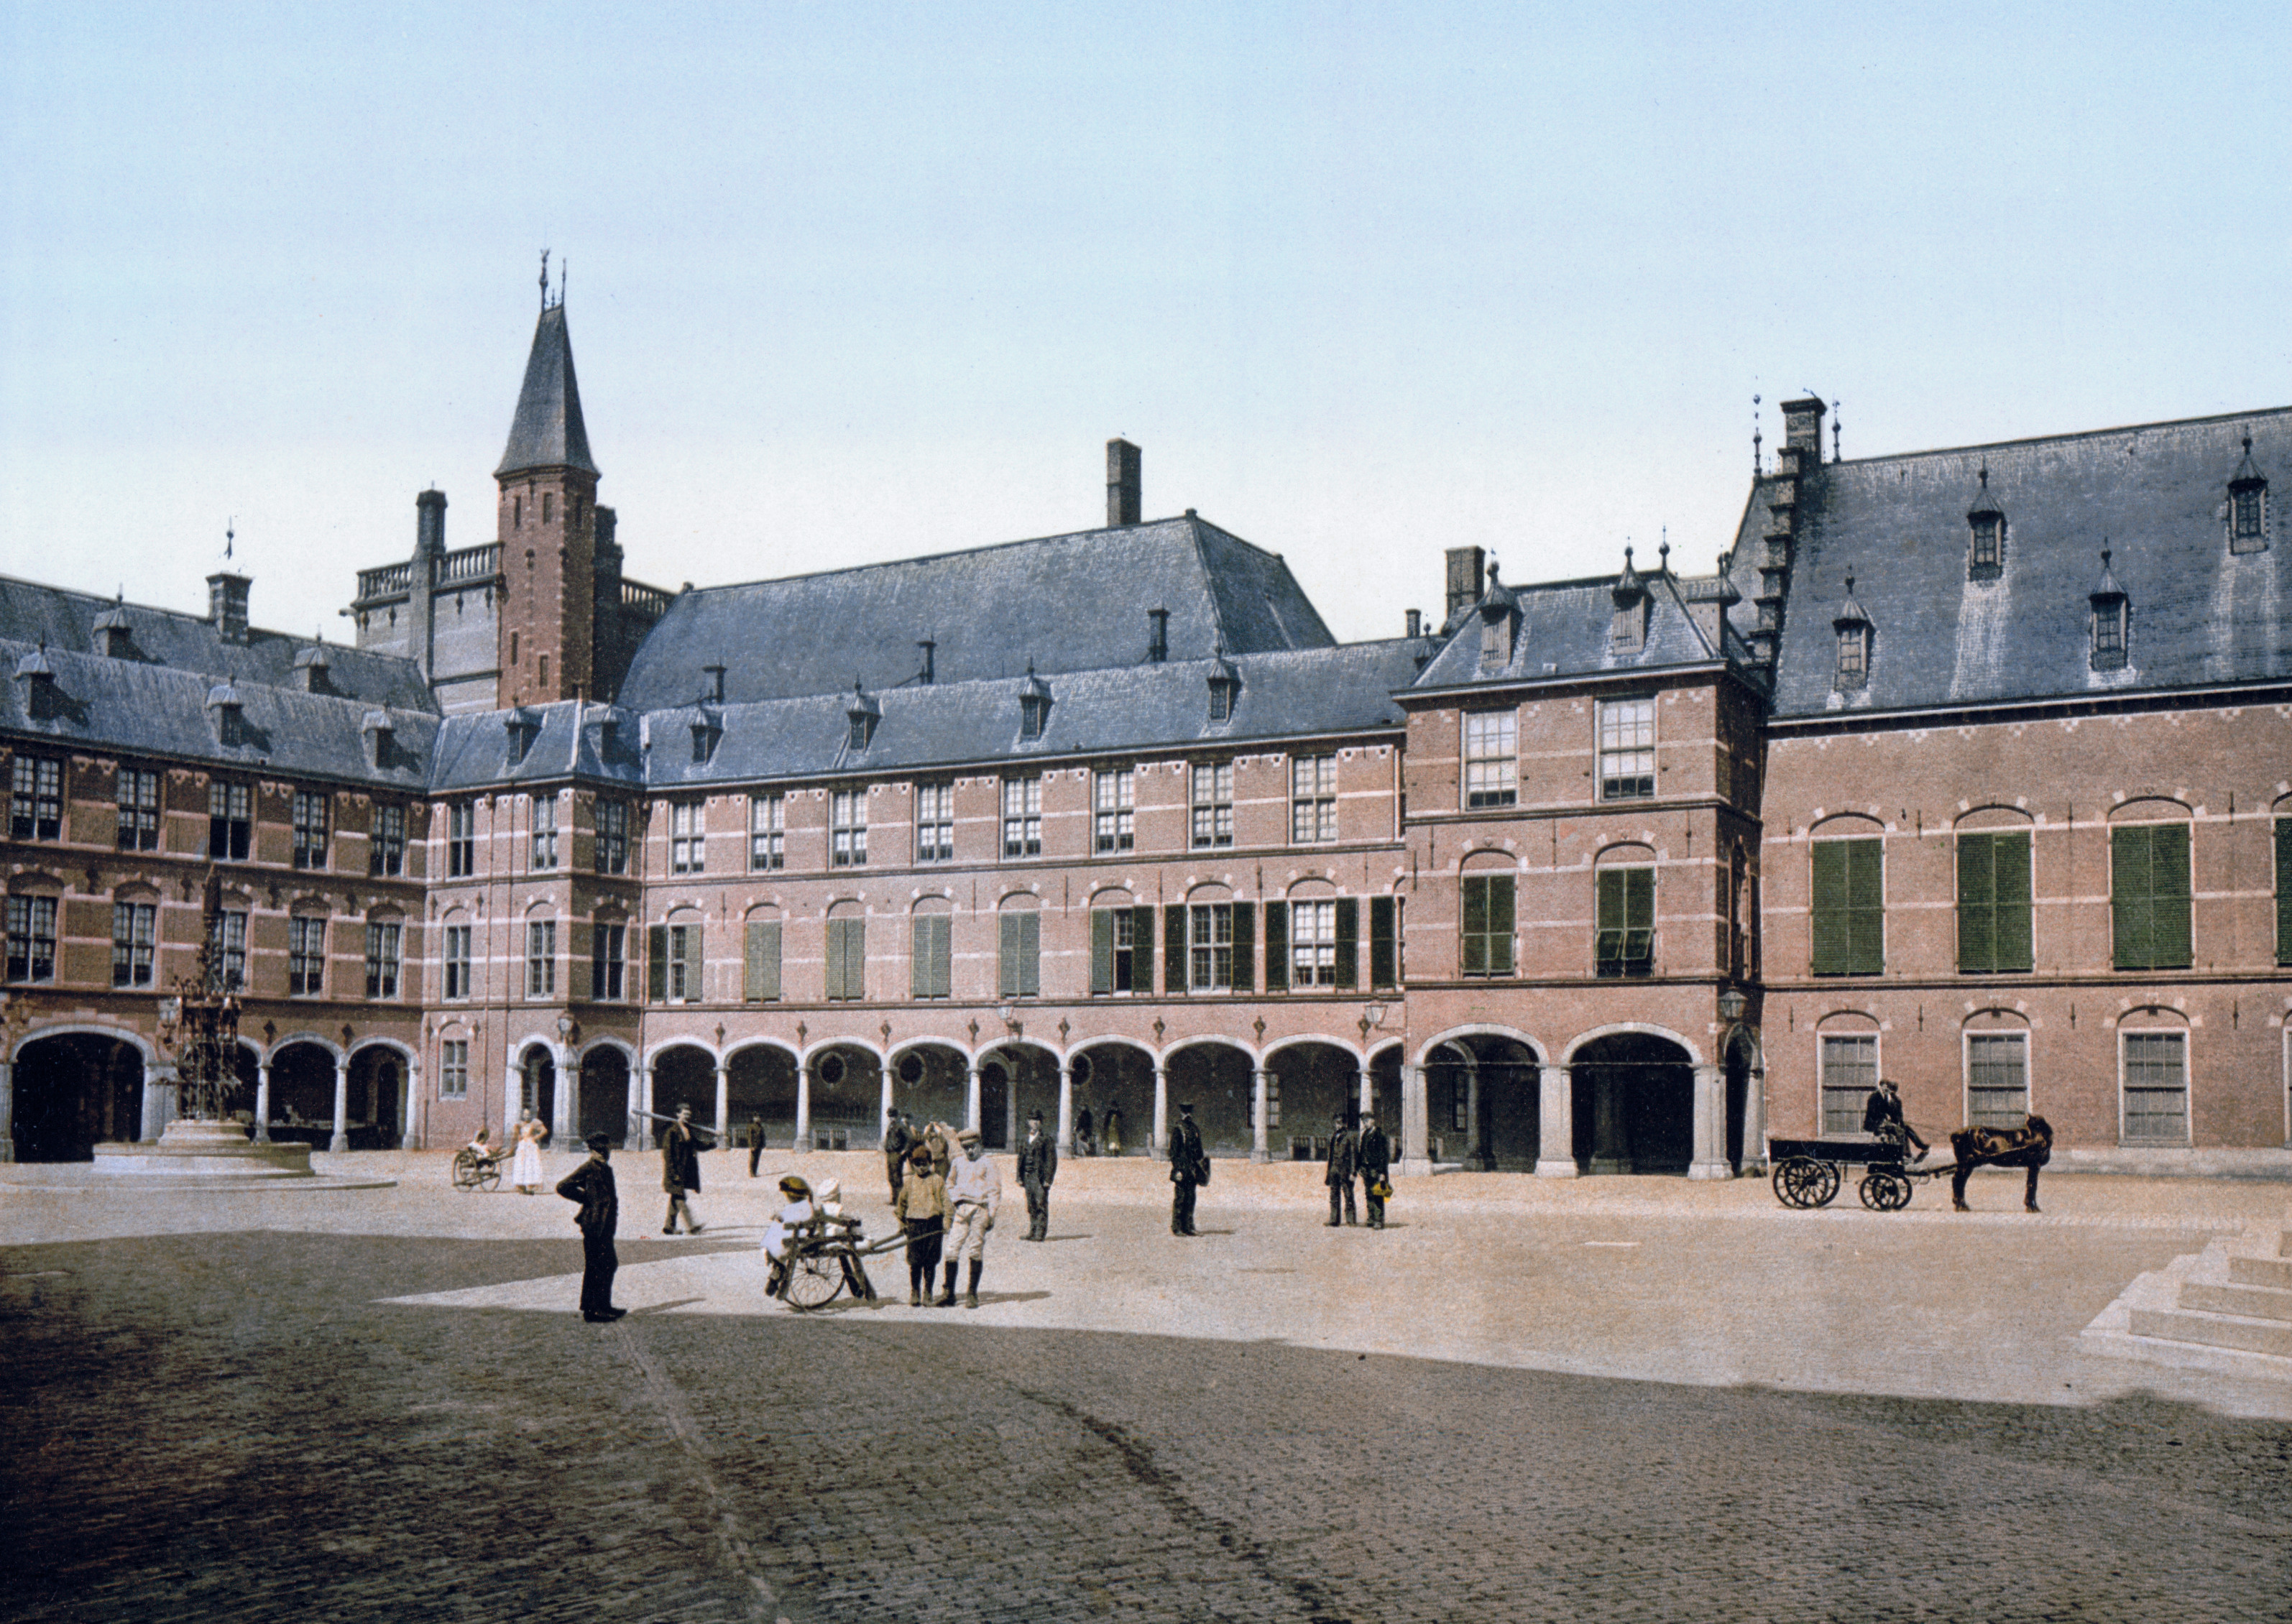 The Hague Netherlands  City pictures : Bestand:Netherlands TheHague binnenhof 1900 Wikipedia